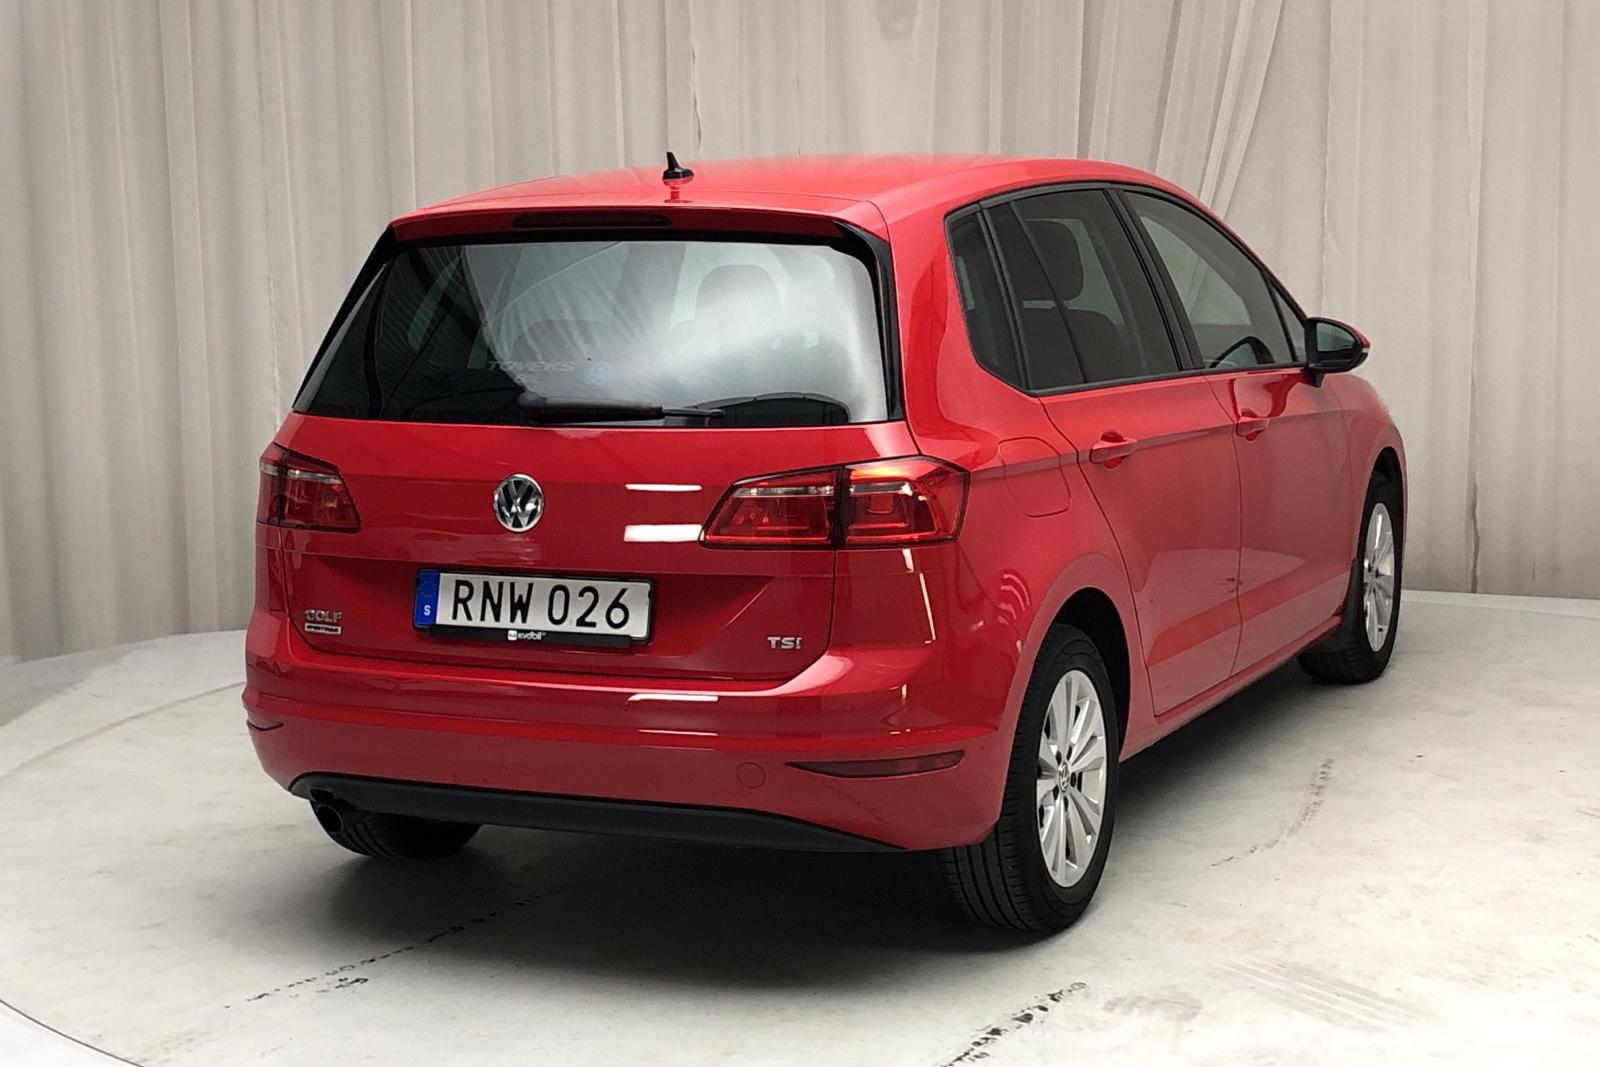 VW Golf VII 1.2 TSI BlueMotion Technology Sportsvan (110hk) - 0 km - Automatic - red - 2018